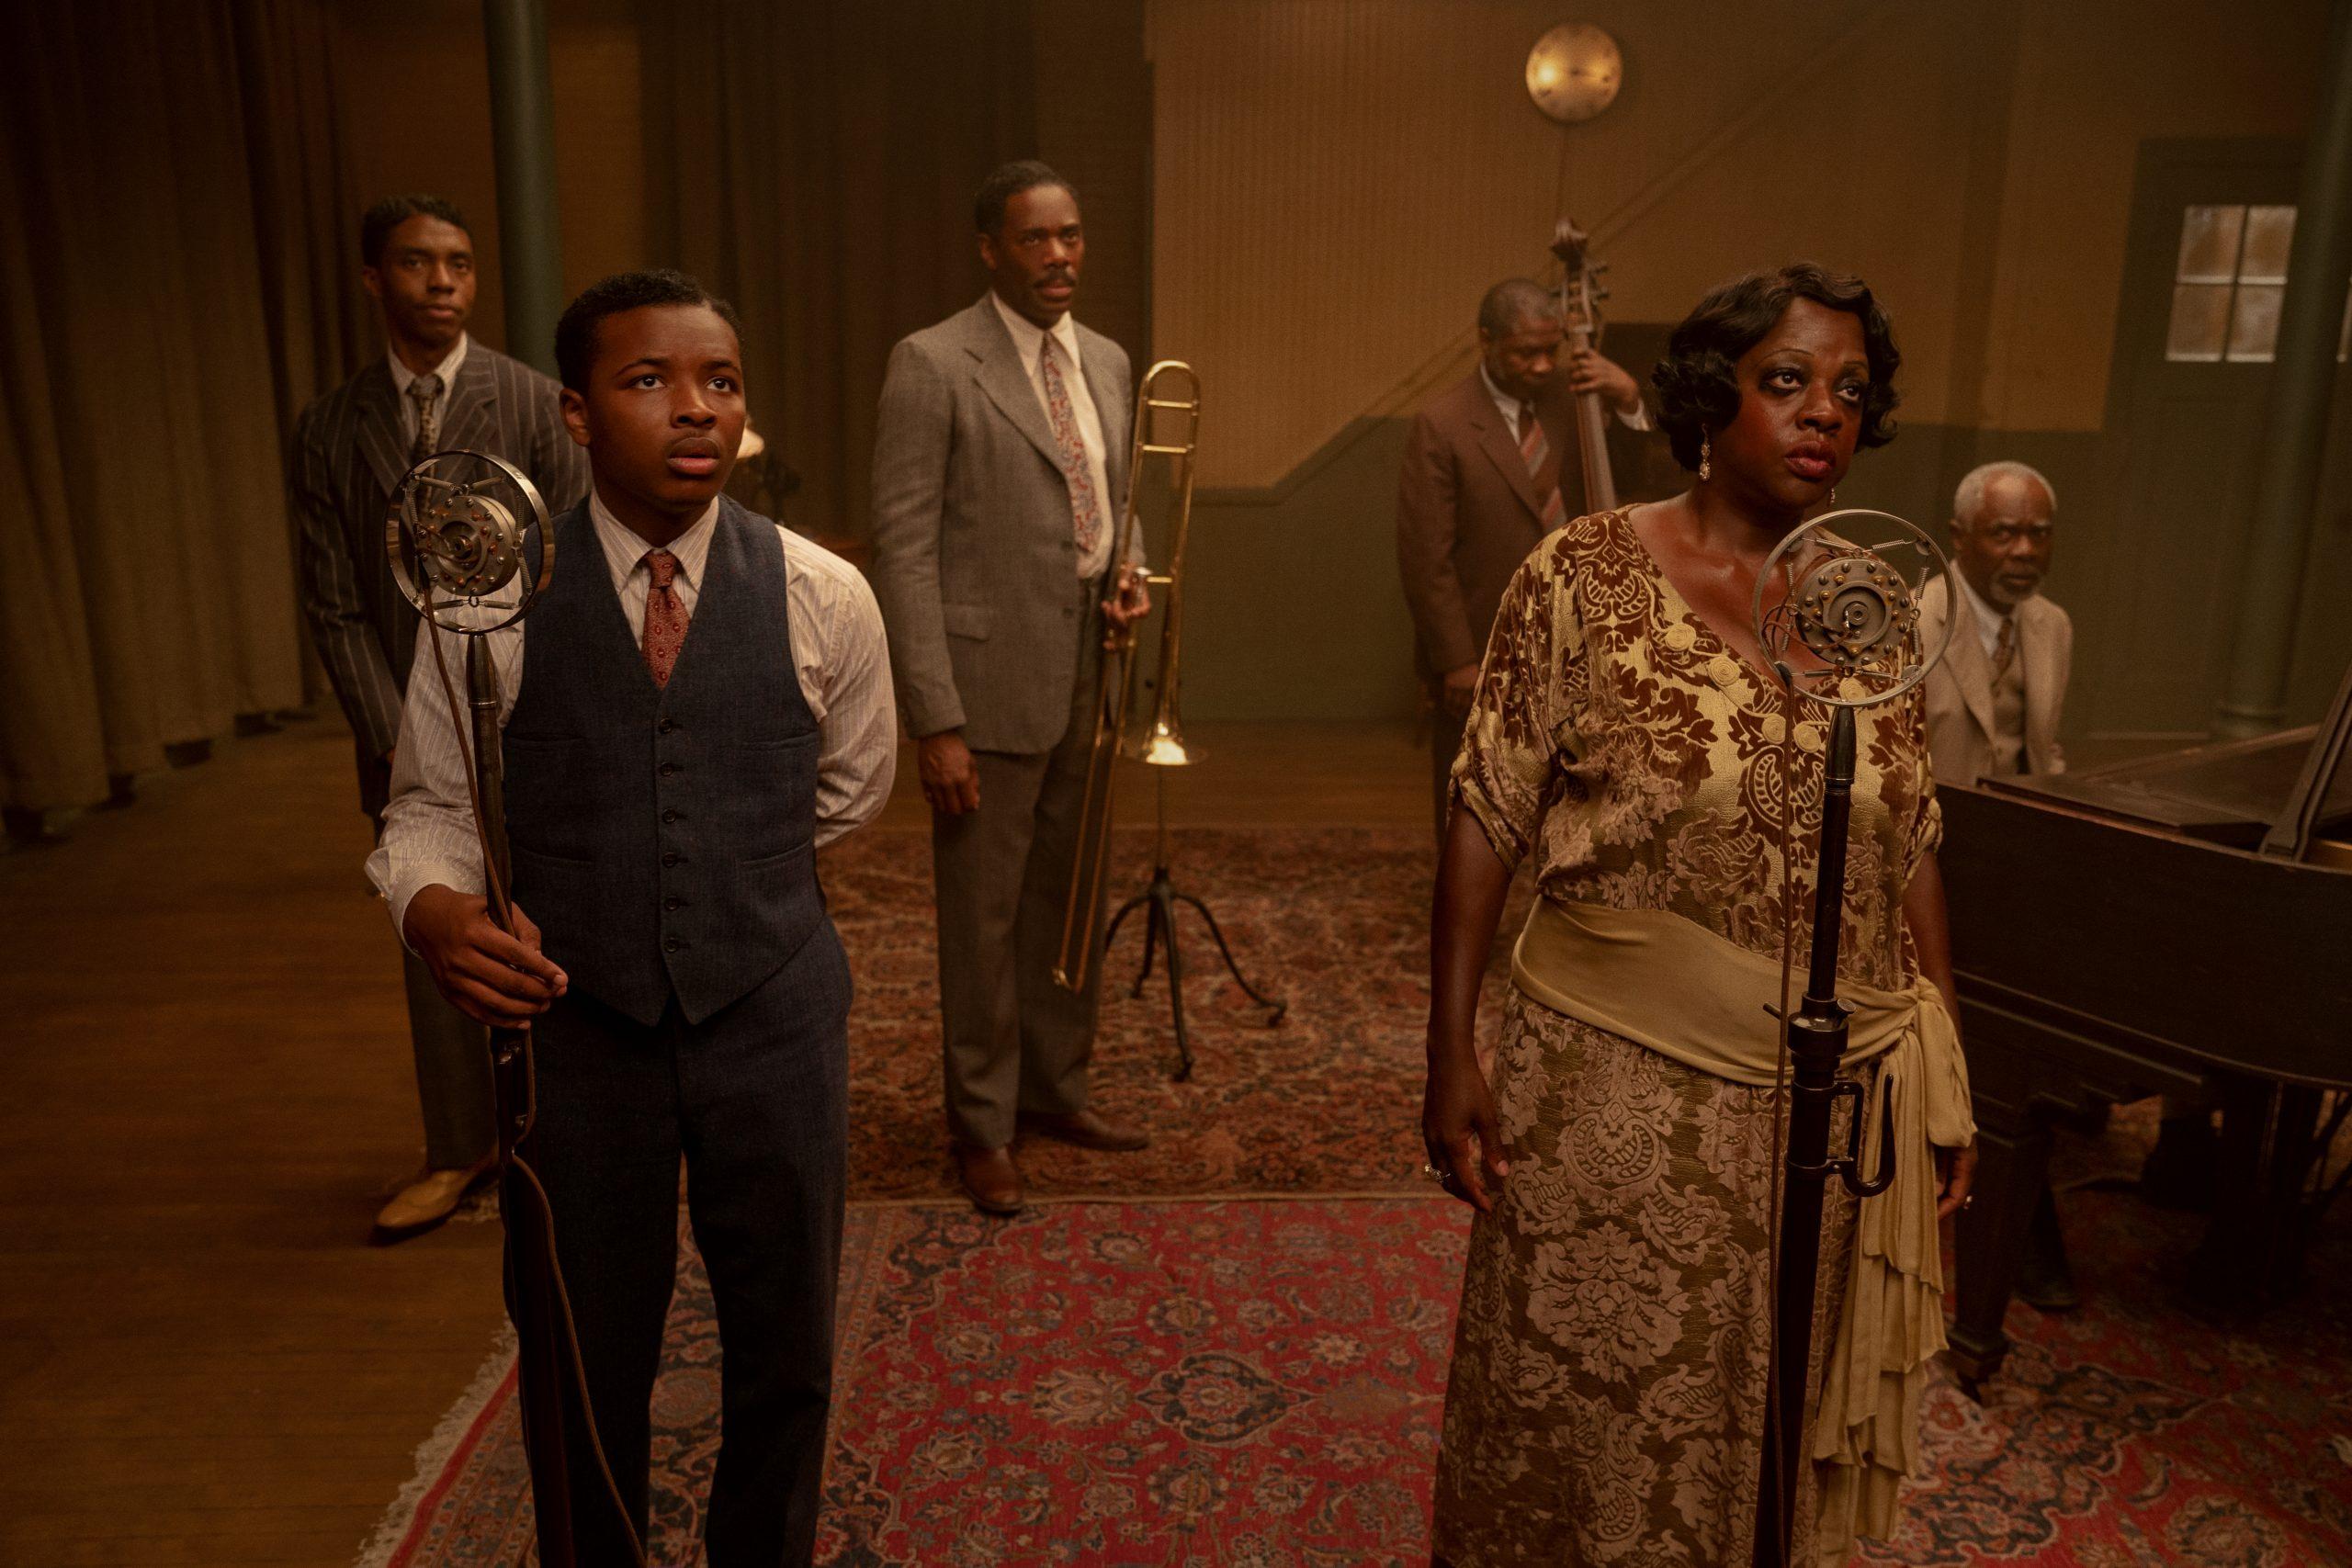 From left to right: Chadwick Boseman, Dusan Brown, Colman Domingo, Michael Potts, Viola Davis, and Glynn Turman in 'Ma Rainey's Black Bottom' on Netflix. (David Lee / Netflix)